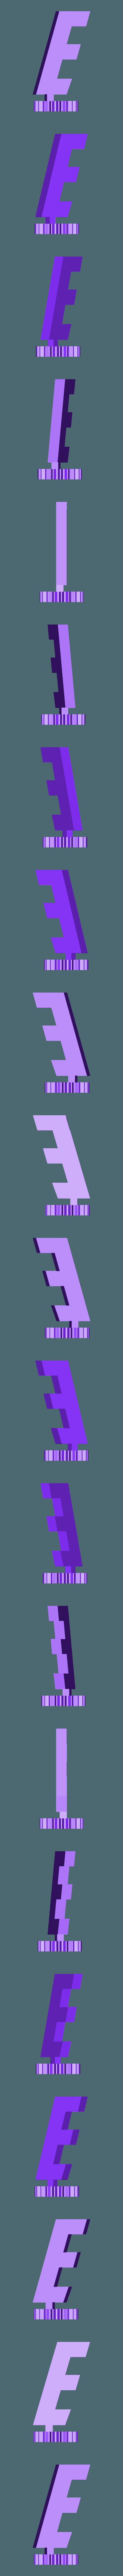 E1, Avengers Logo.STL Download free STL file Avengers Rotating Logo • 3D printing template, potentprintables